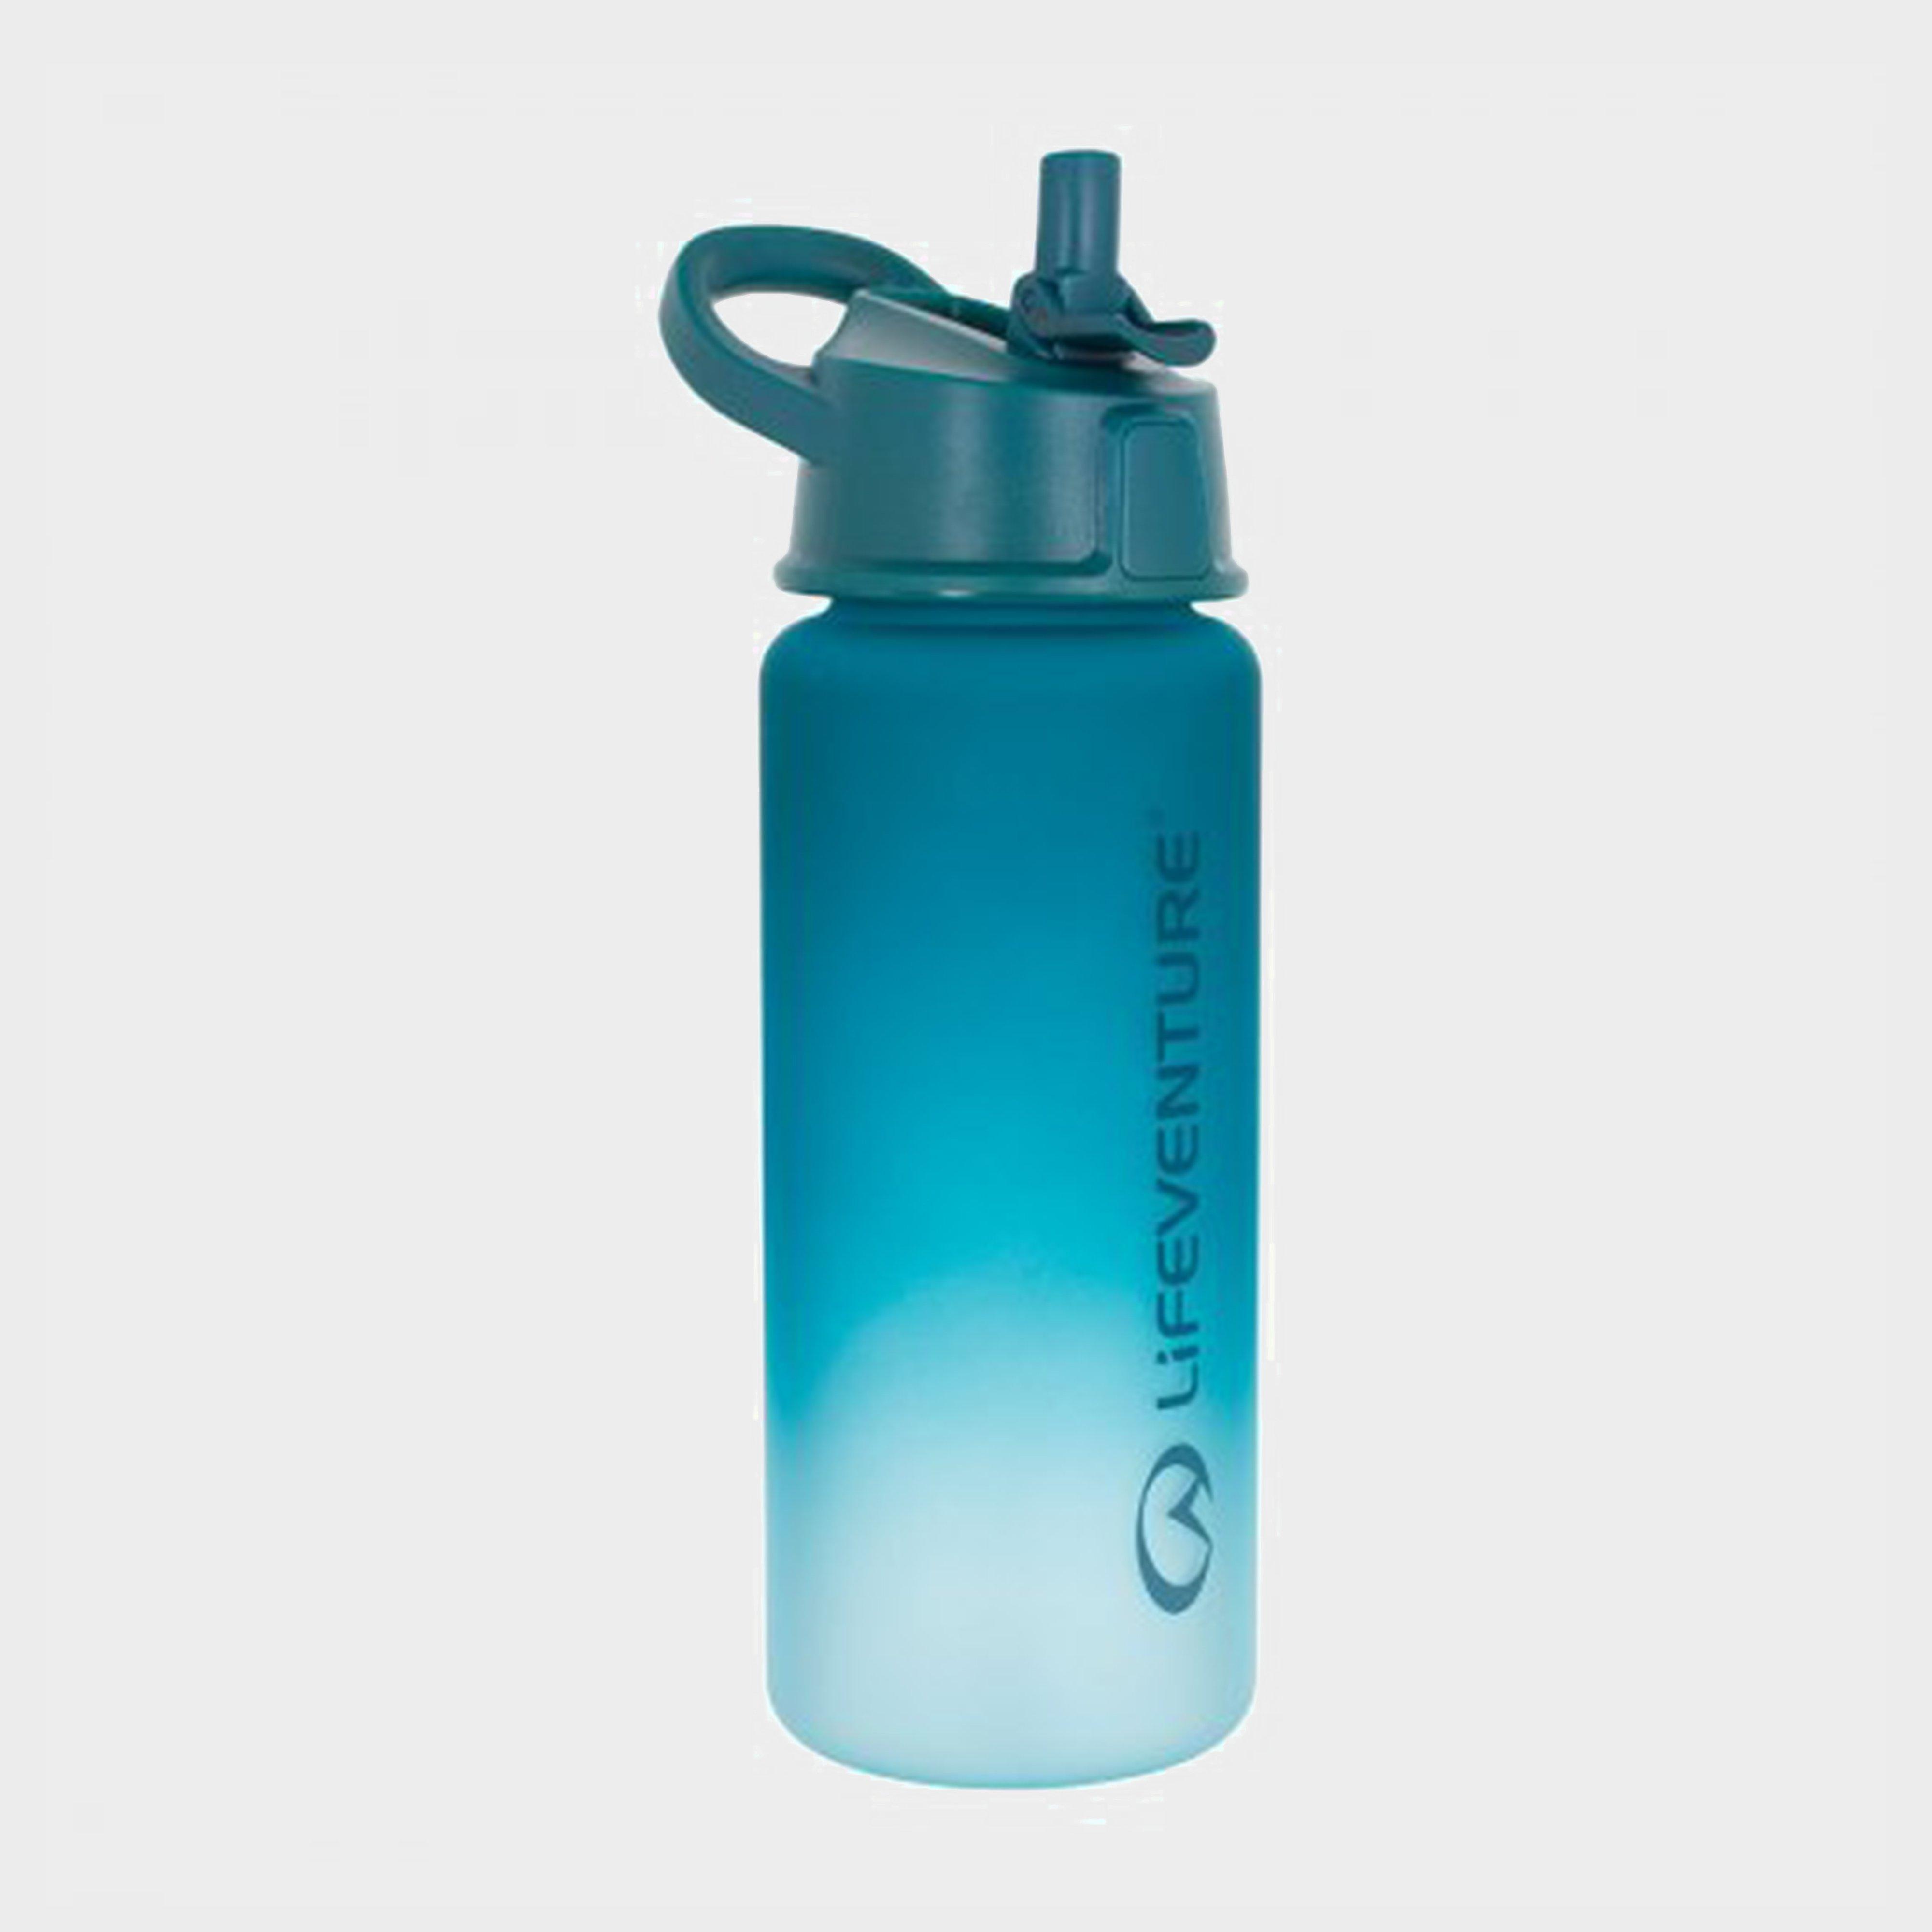 Lifeventure Lifeventure Flip Top Bottle - Blue, Blue